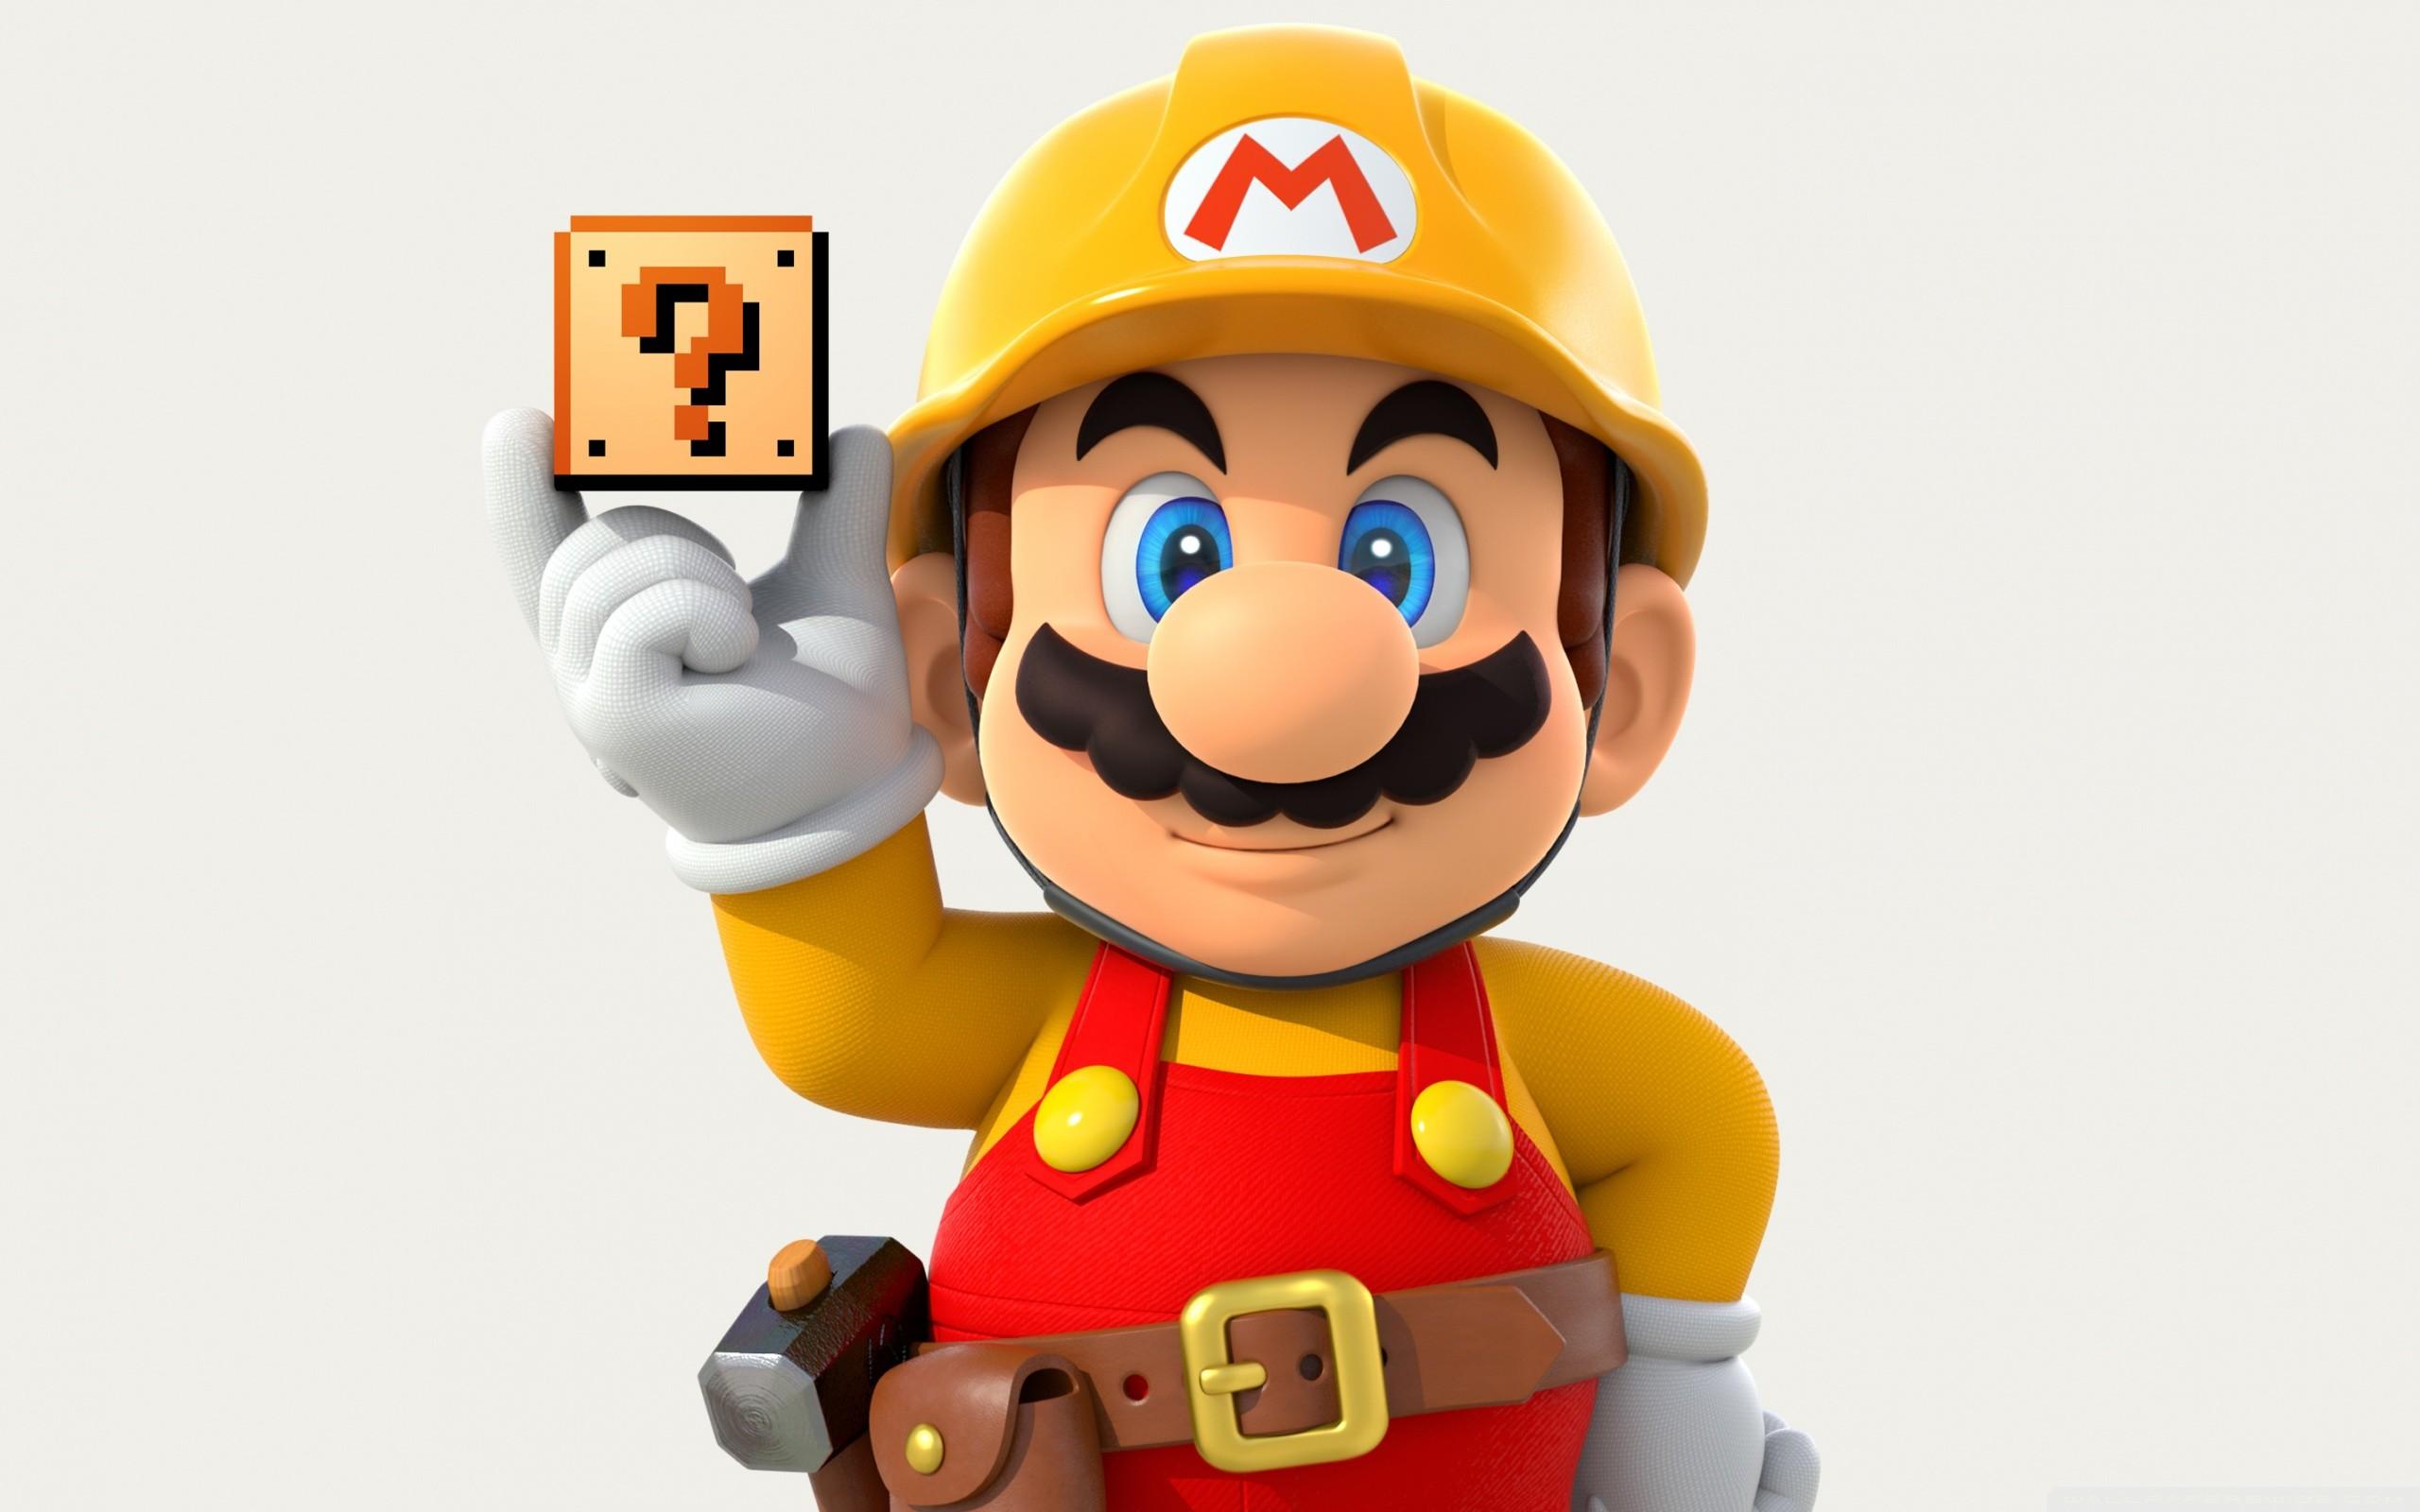 Super Mario Maker HD Wide Wallpaper for Widescreen